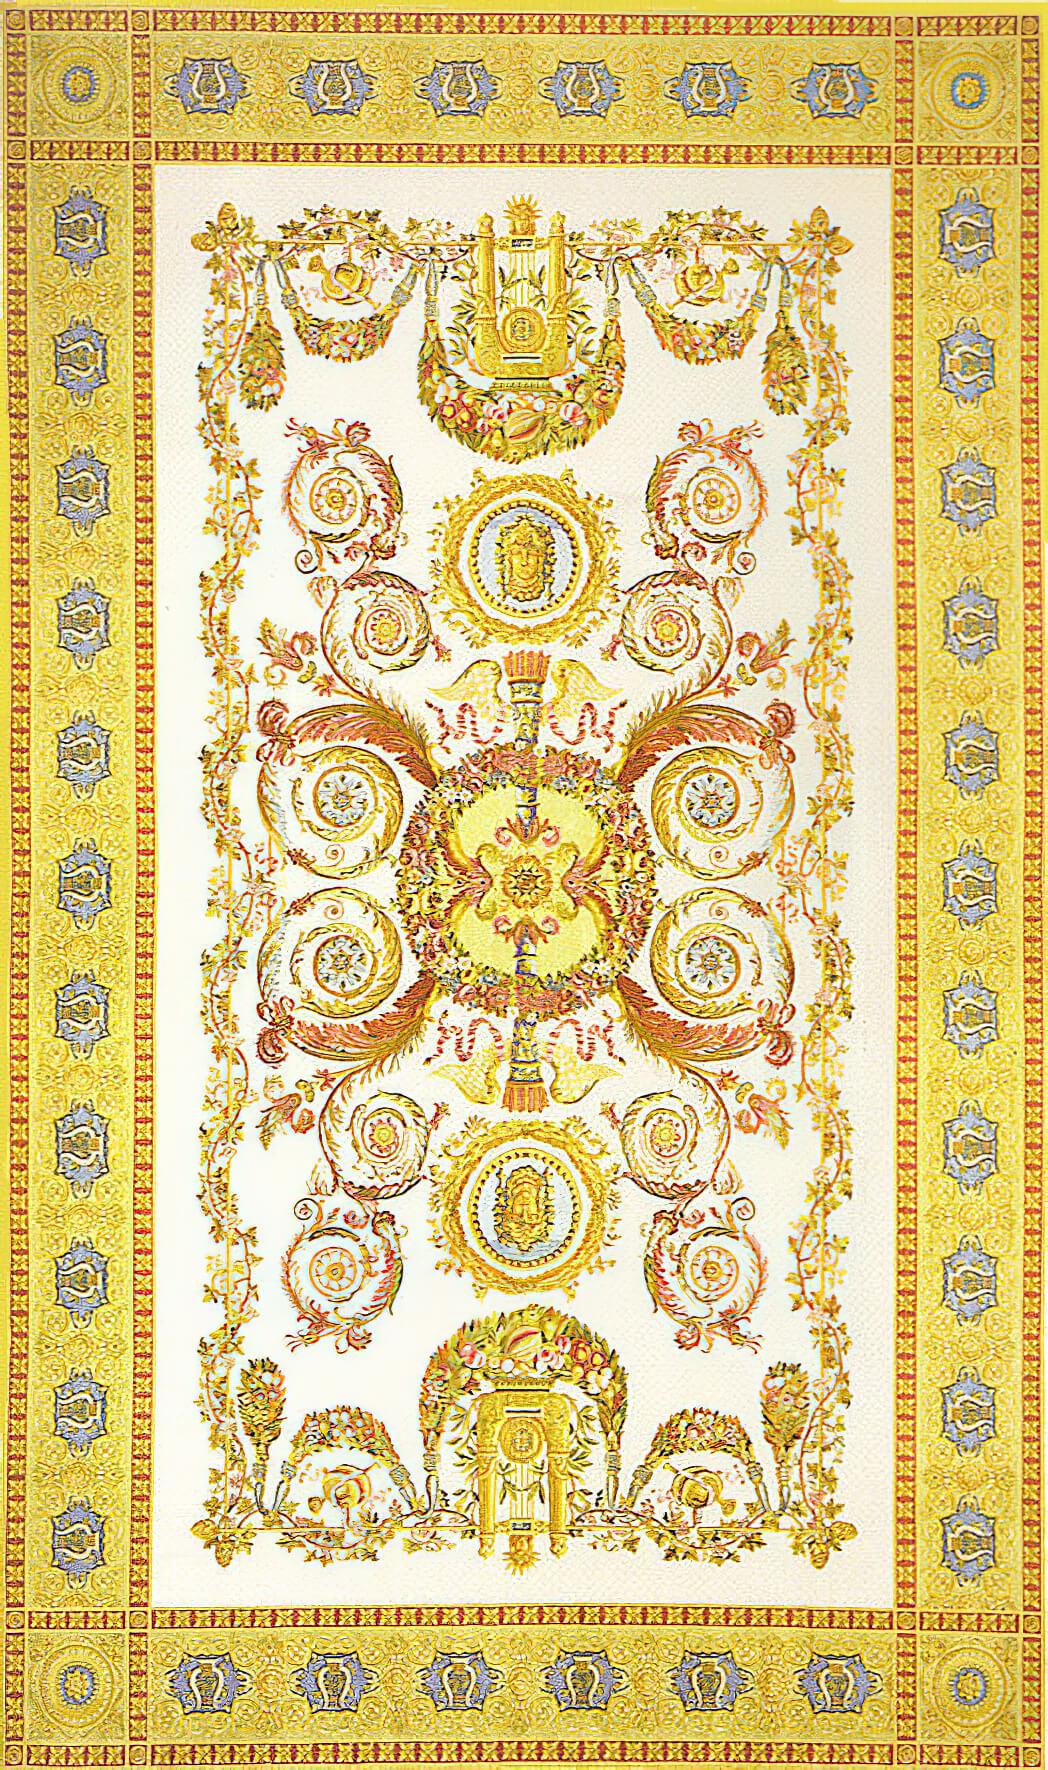 Savonnerie Carpet - Craigie Stockwell